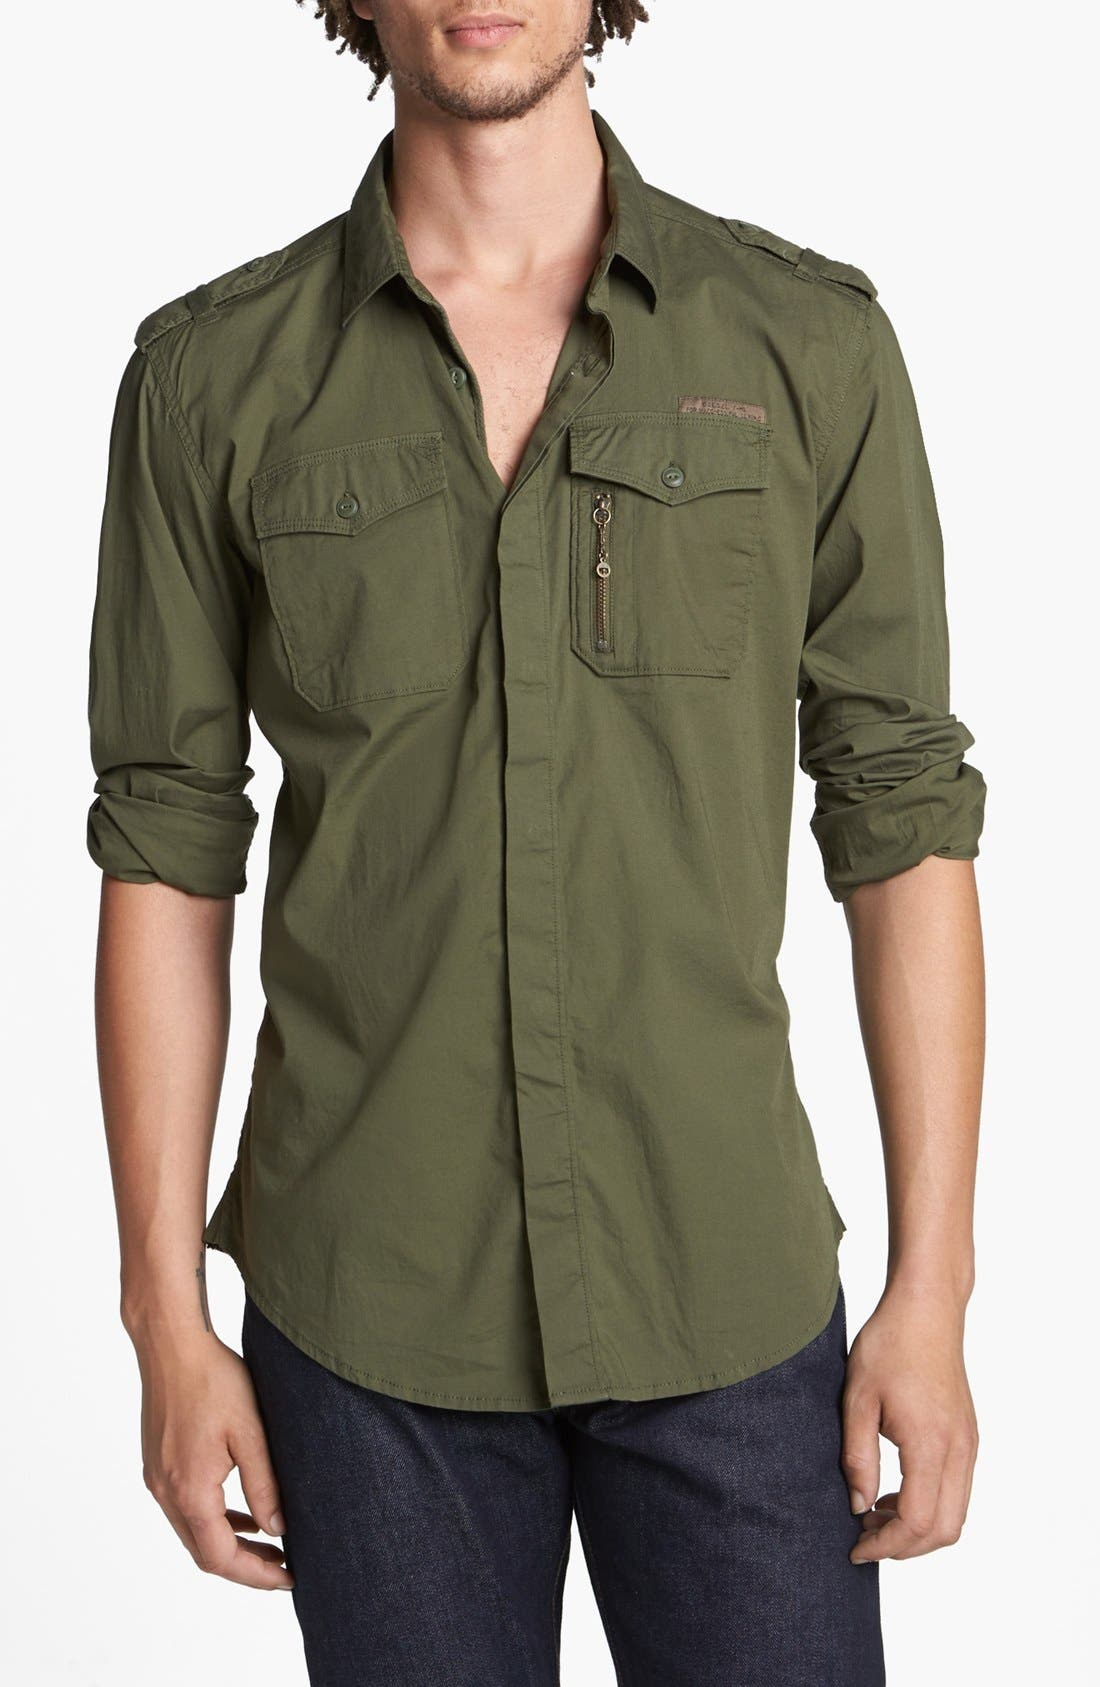 Alternate Image 1 Selected - DIESEL® 'Siranella' Shirt